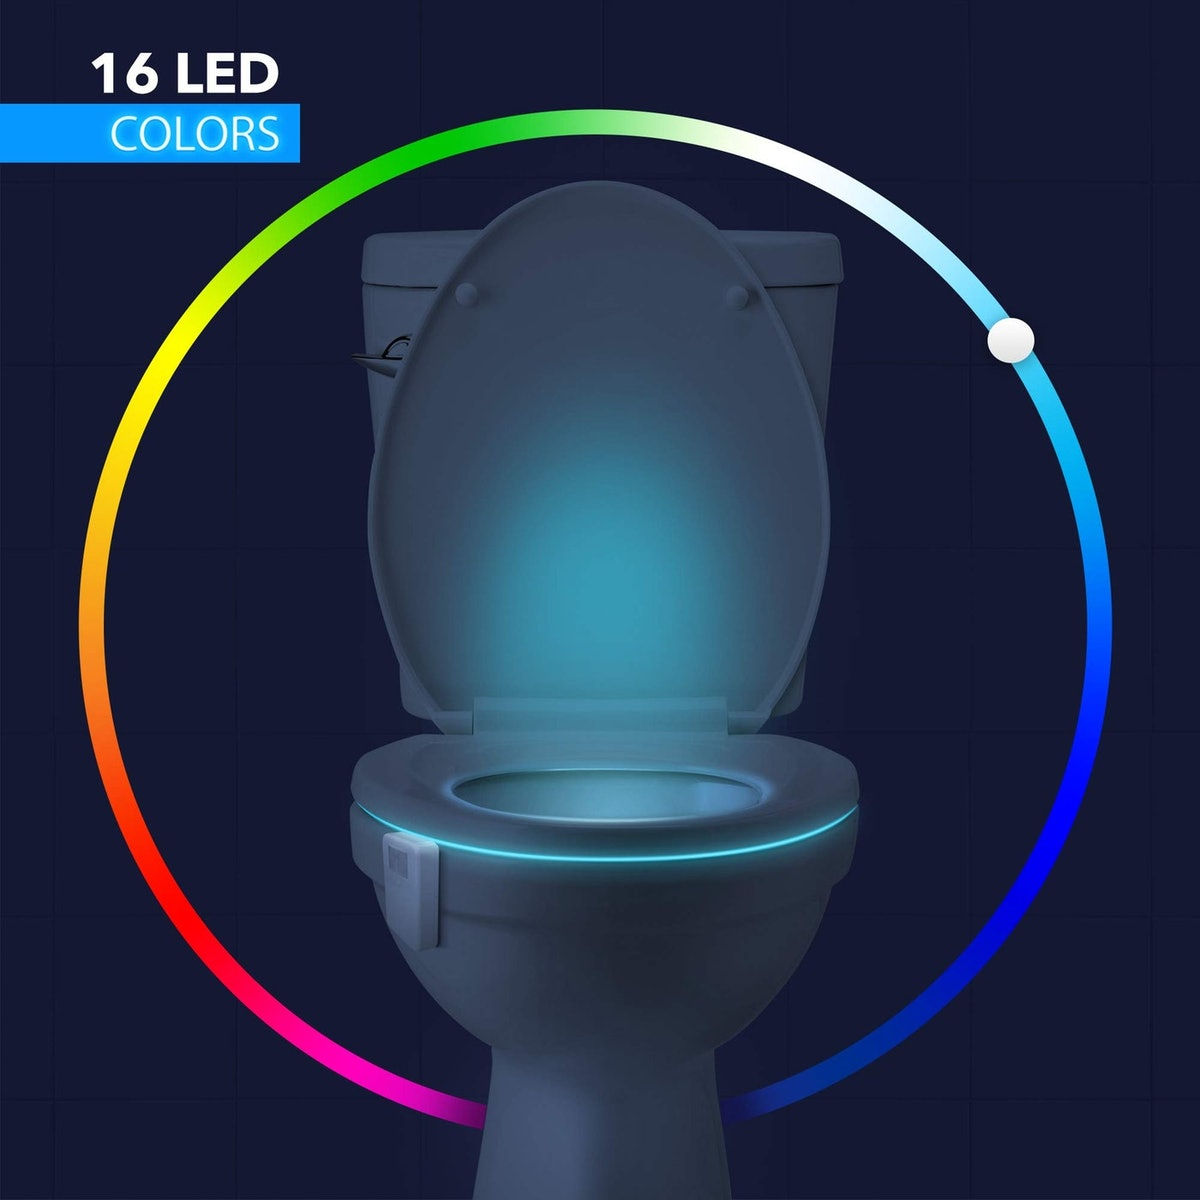 LumiLux Motion Sensor Toilet Light